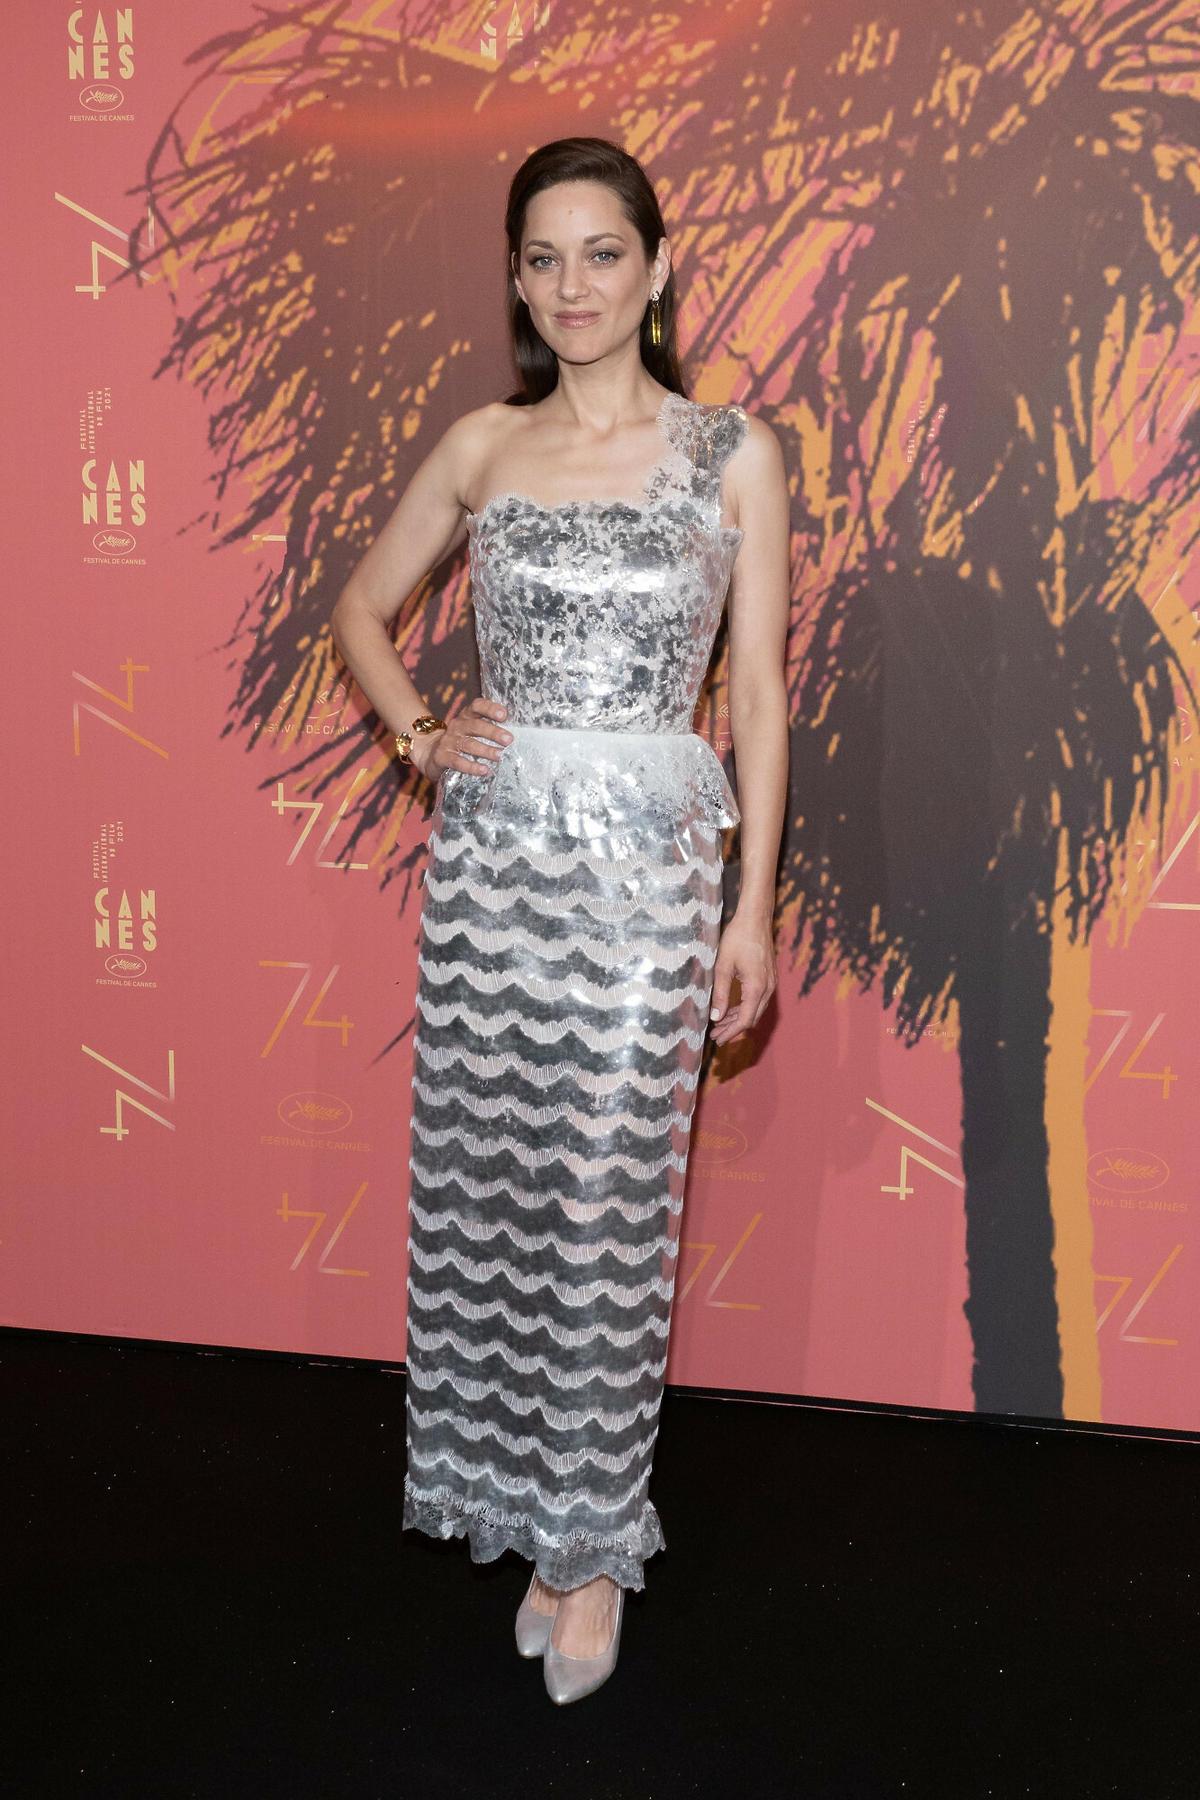 Cannes 2021: Marion Cotillard